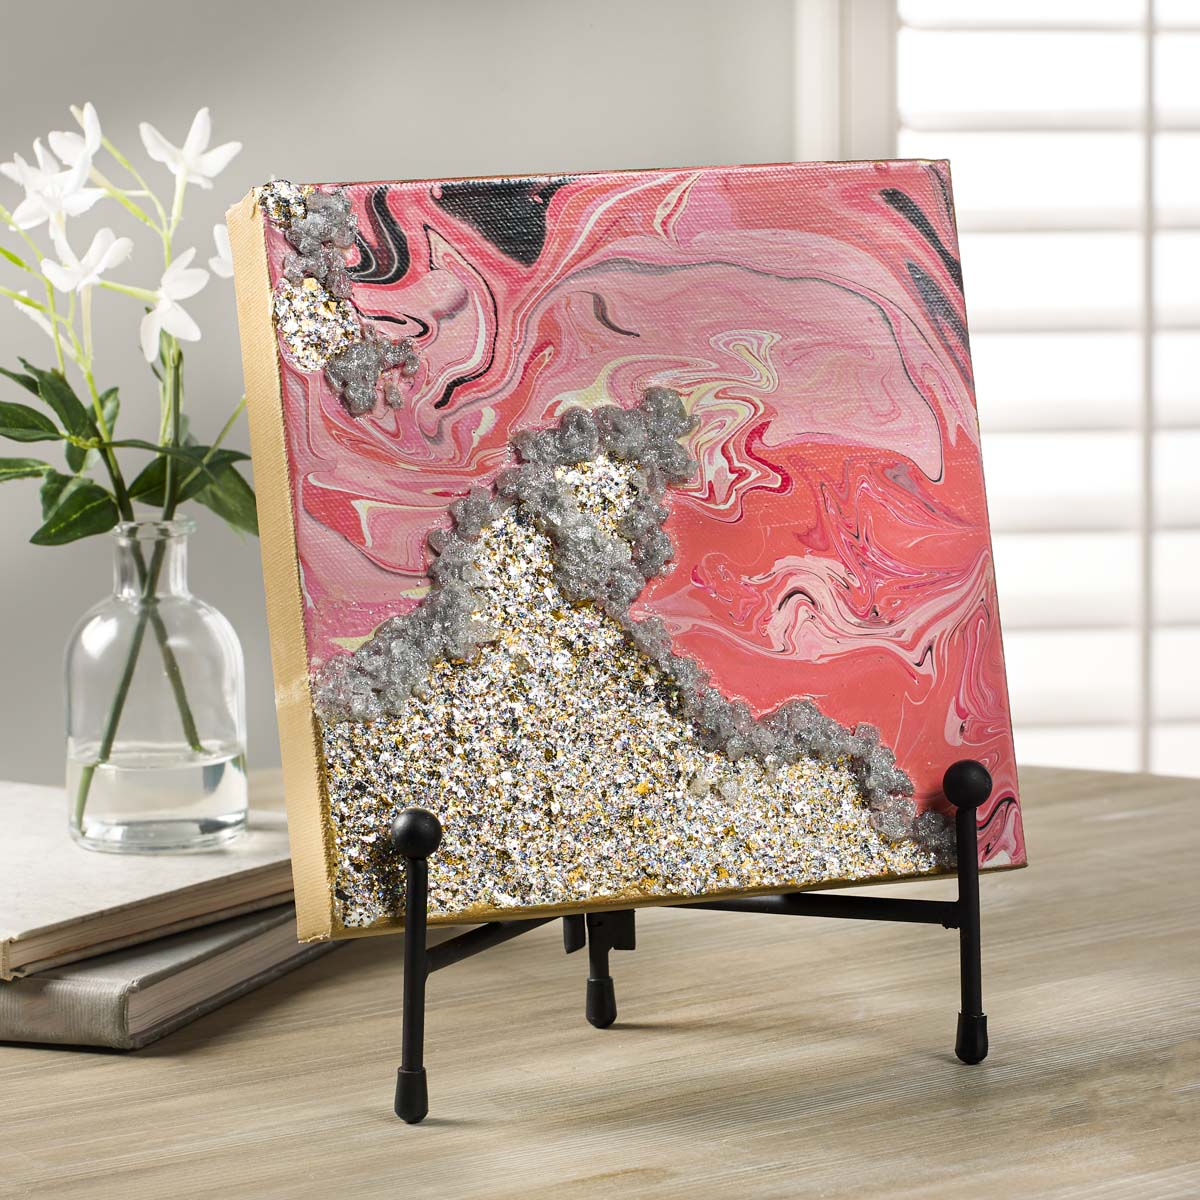 FolkArt ® Glitterific™ Icons Acrylic Paint Set 4 Color - 7504